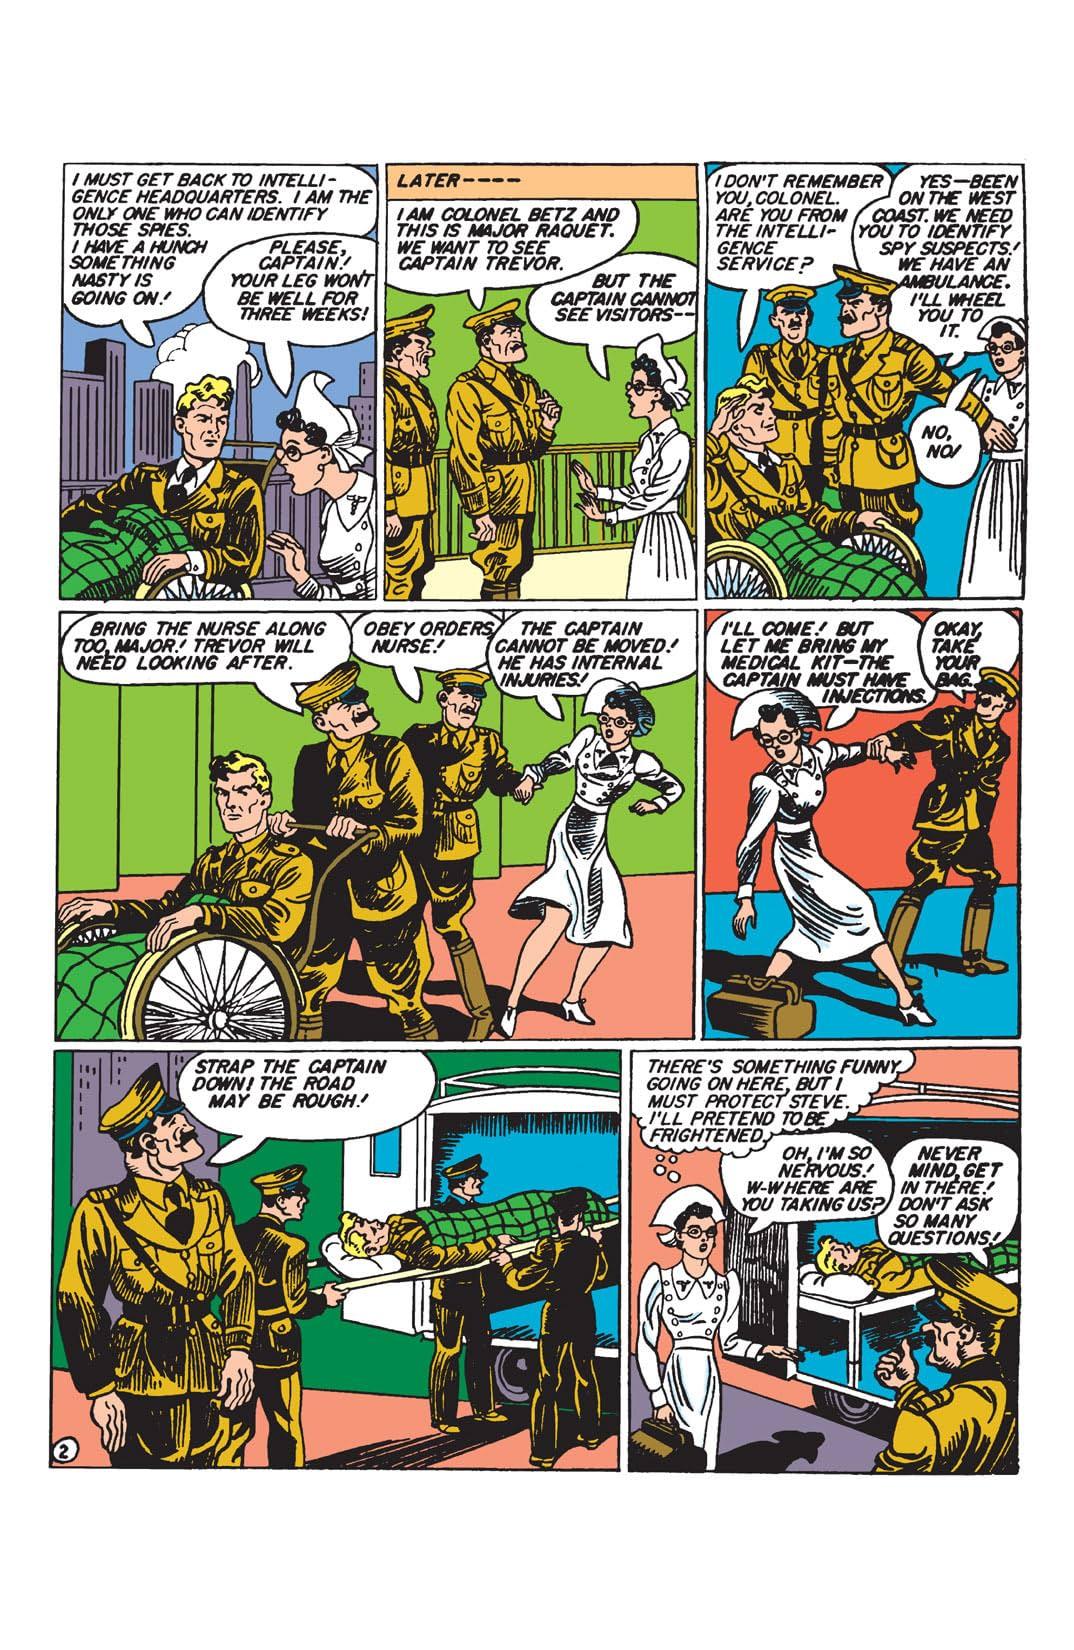 Sensation Comics #2-3